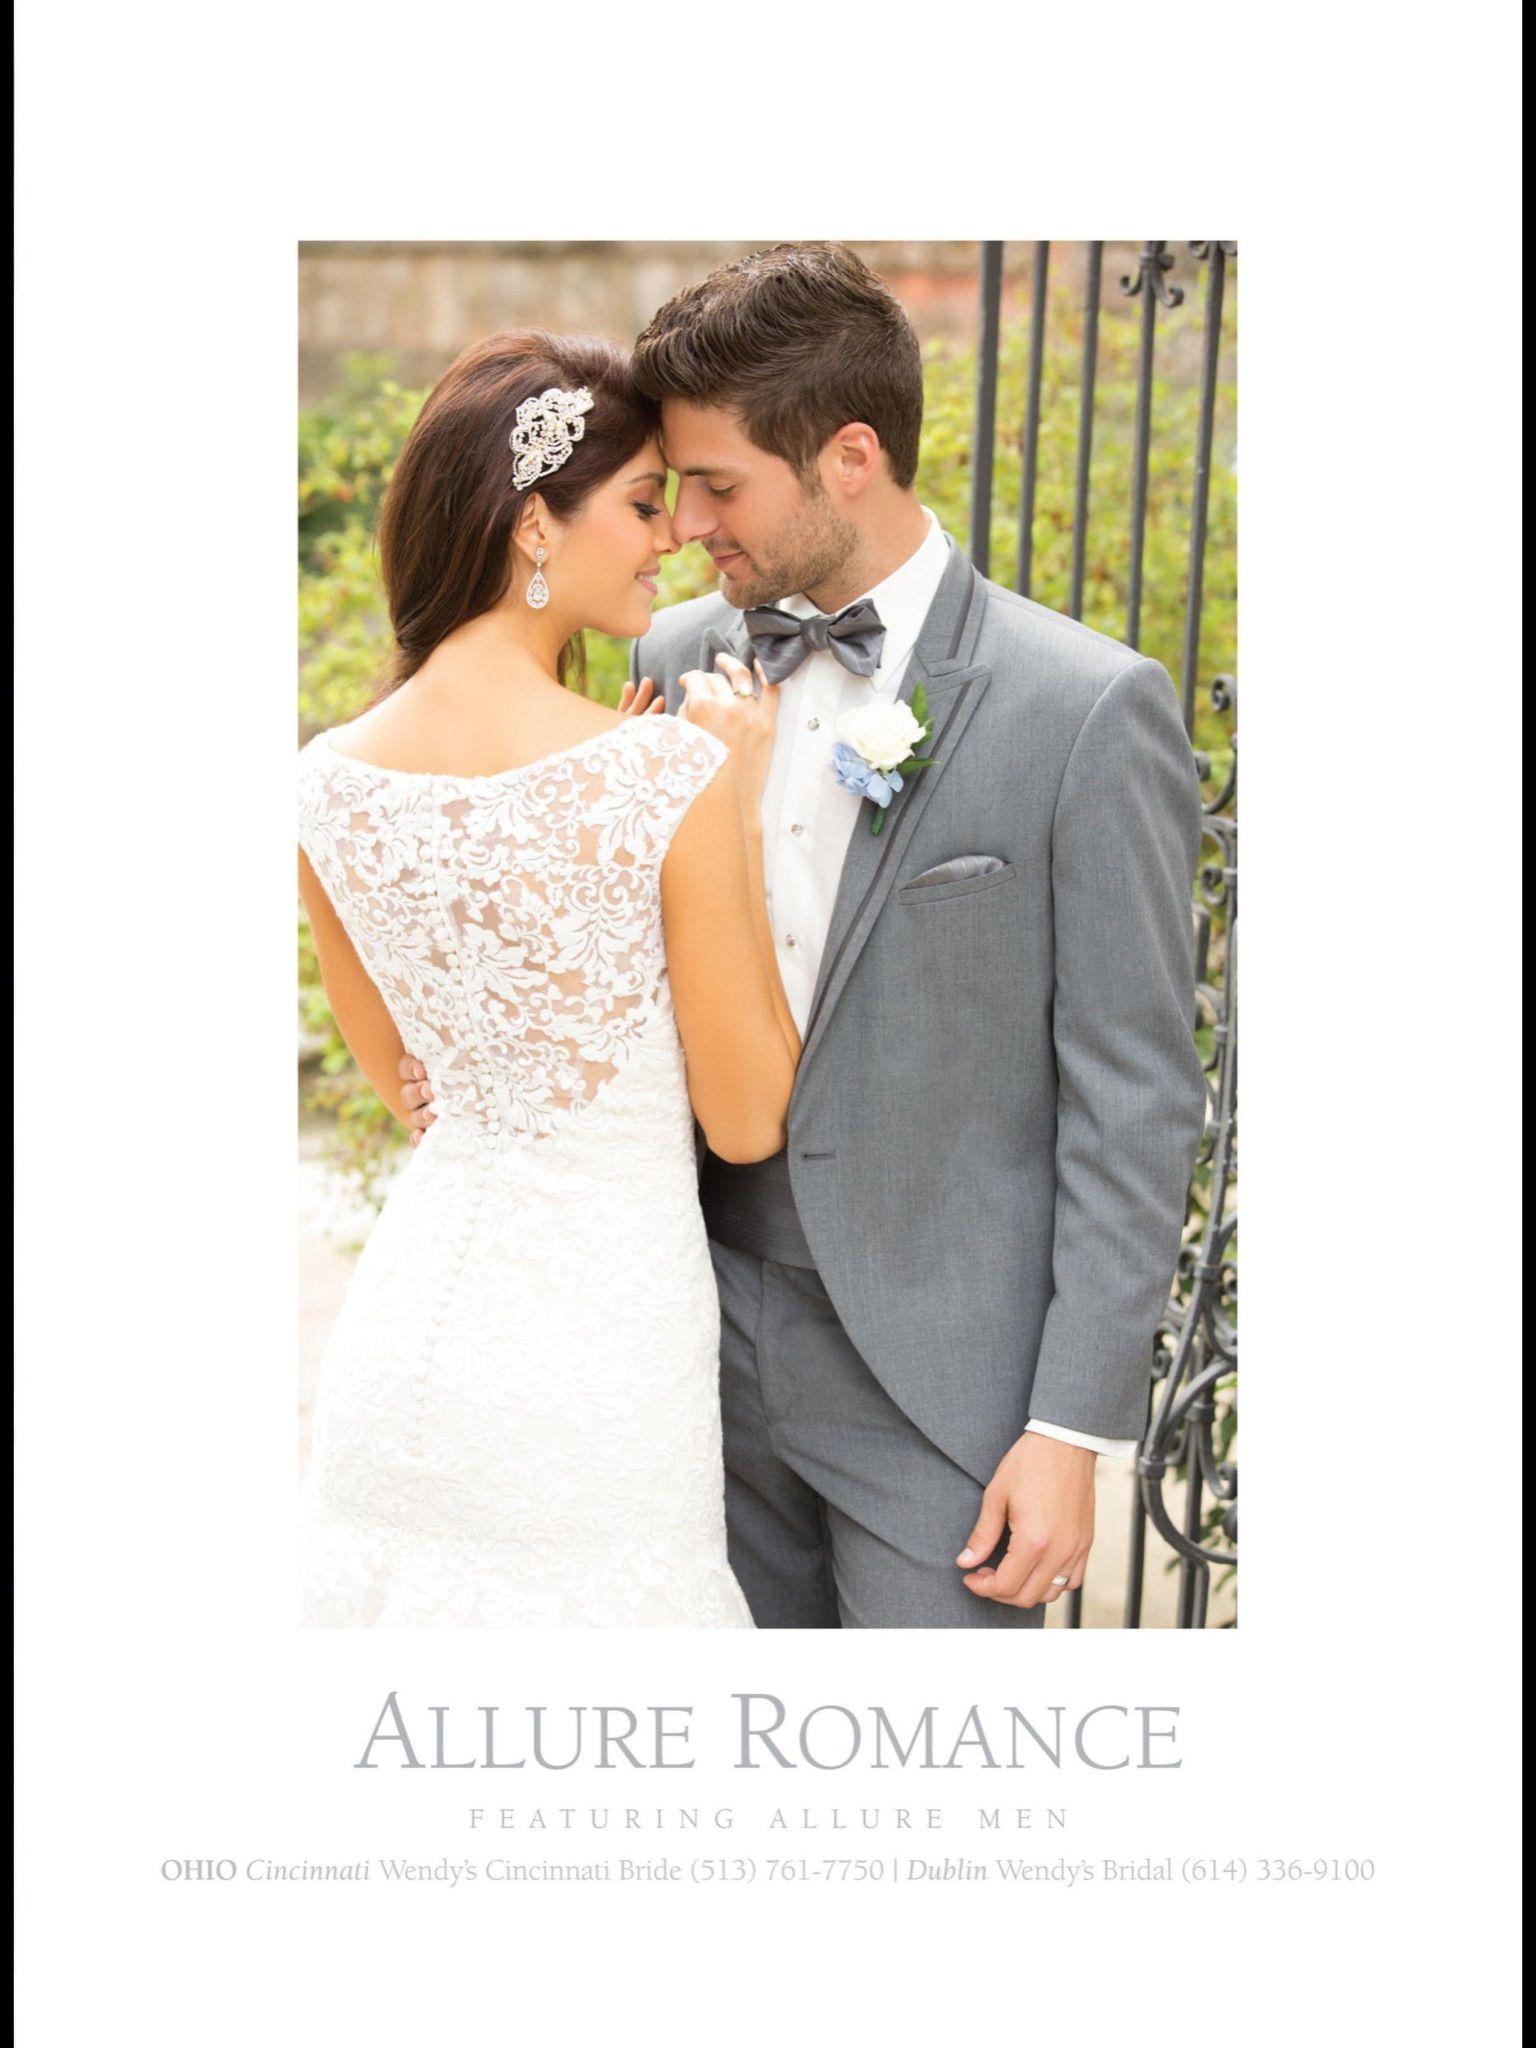 Pin by elle reimer on wedding dress pinterest wedding dress and